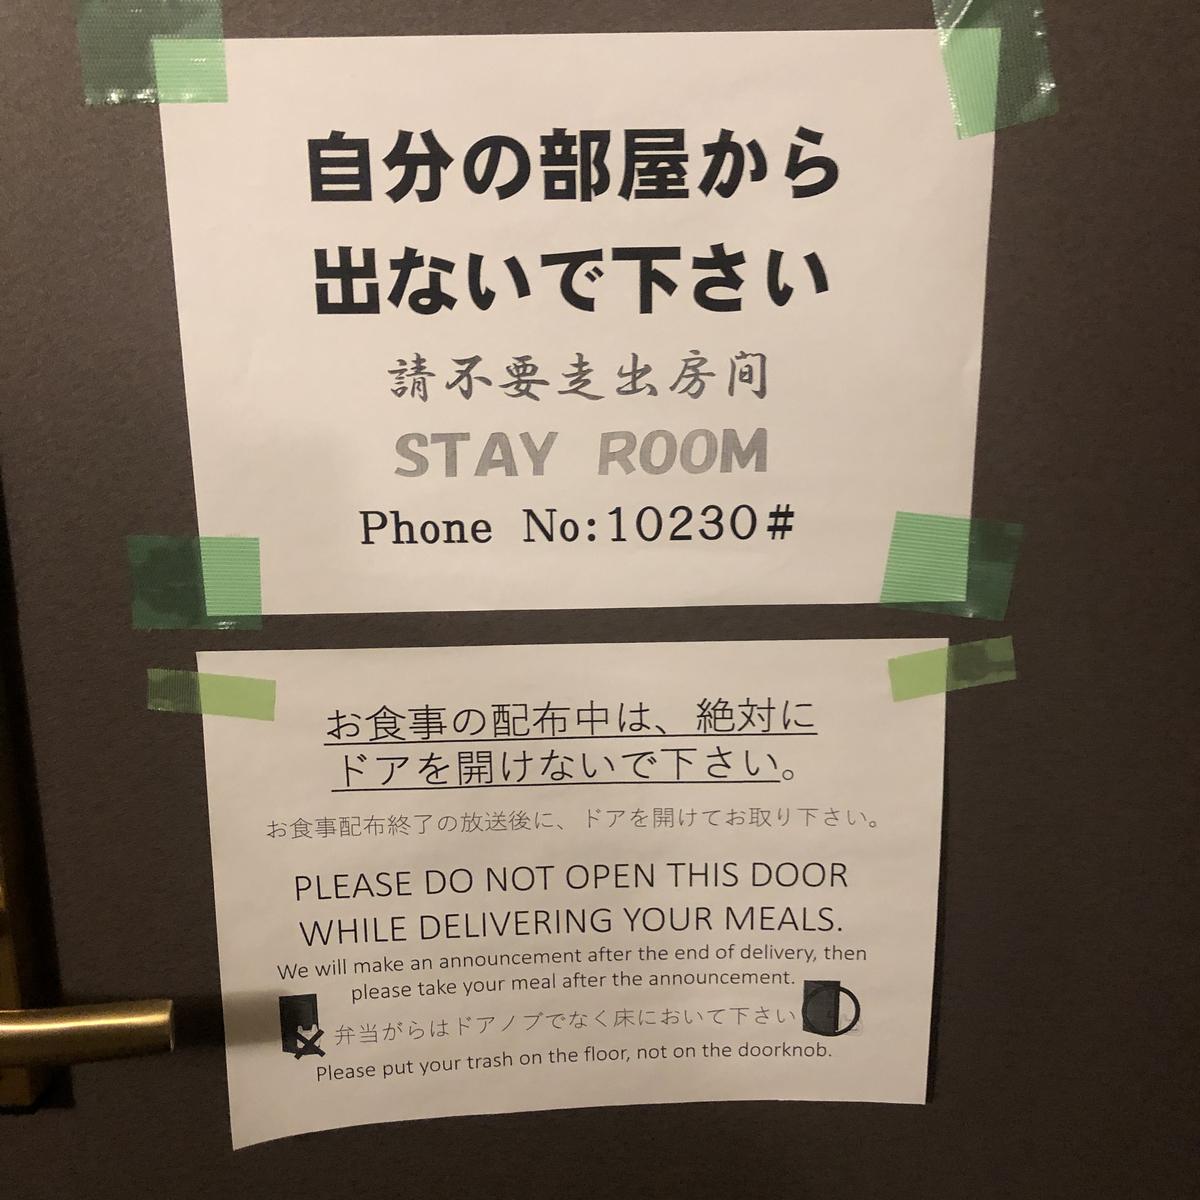 f:id:Iwashi-Tumire:20210310140604j:plain